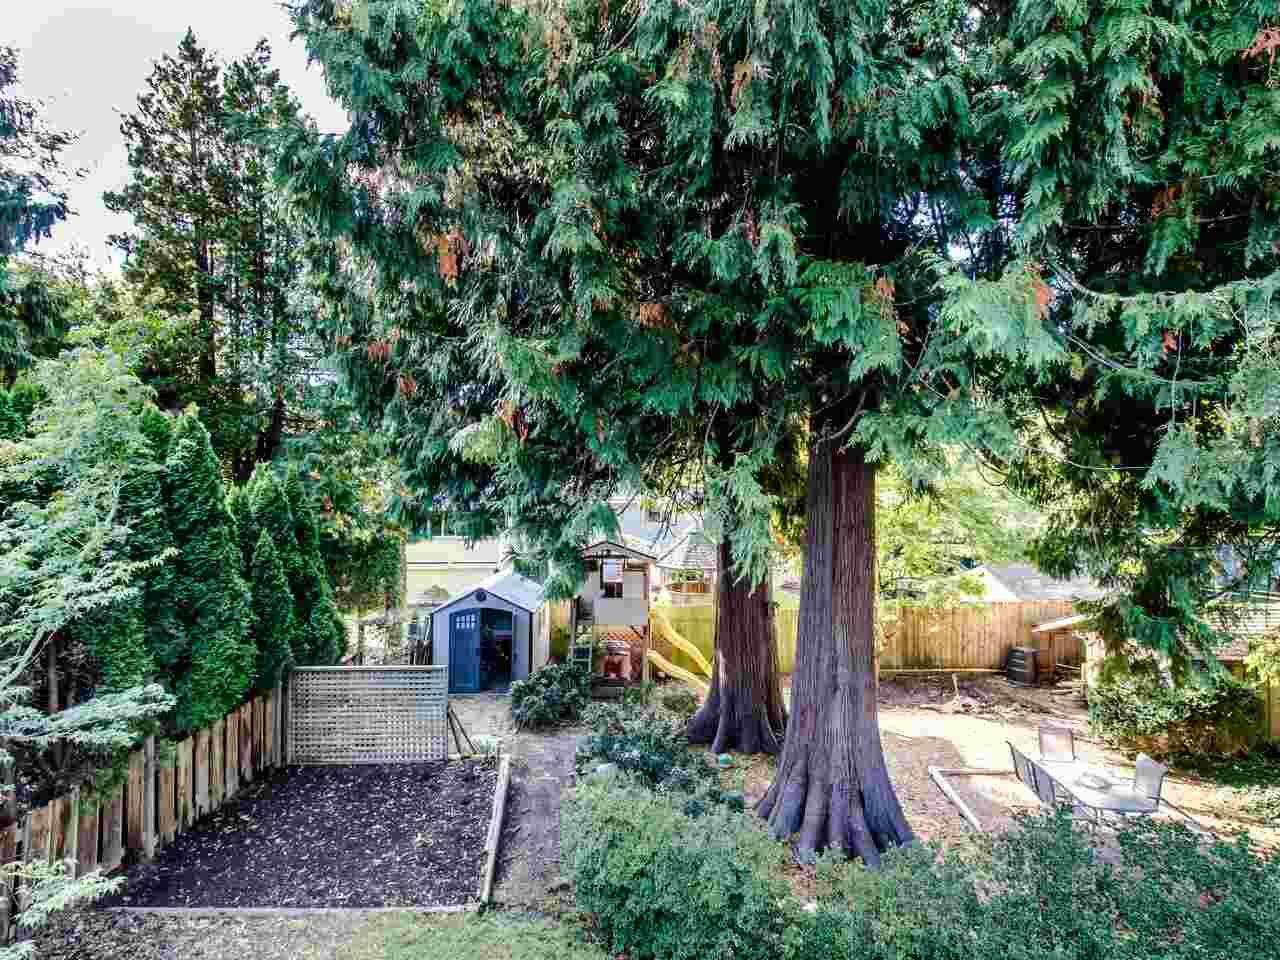 Photo 21: Photos: 11505 PEMBERTON Crescent in Delta: Annieville House for sale (N. Delta)  : MLS®# R2512135